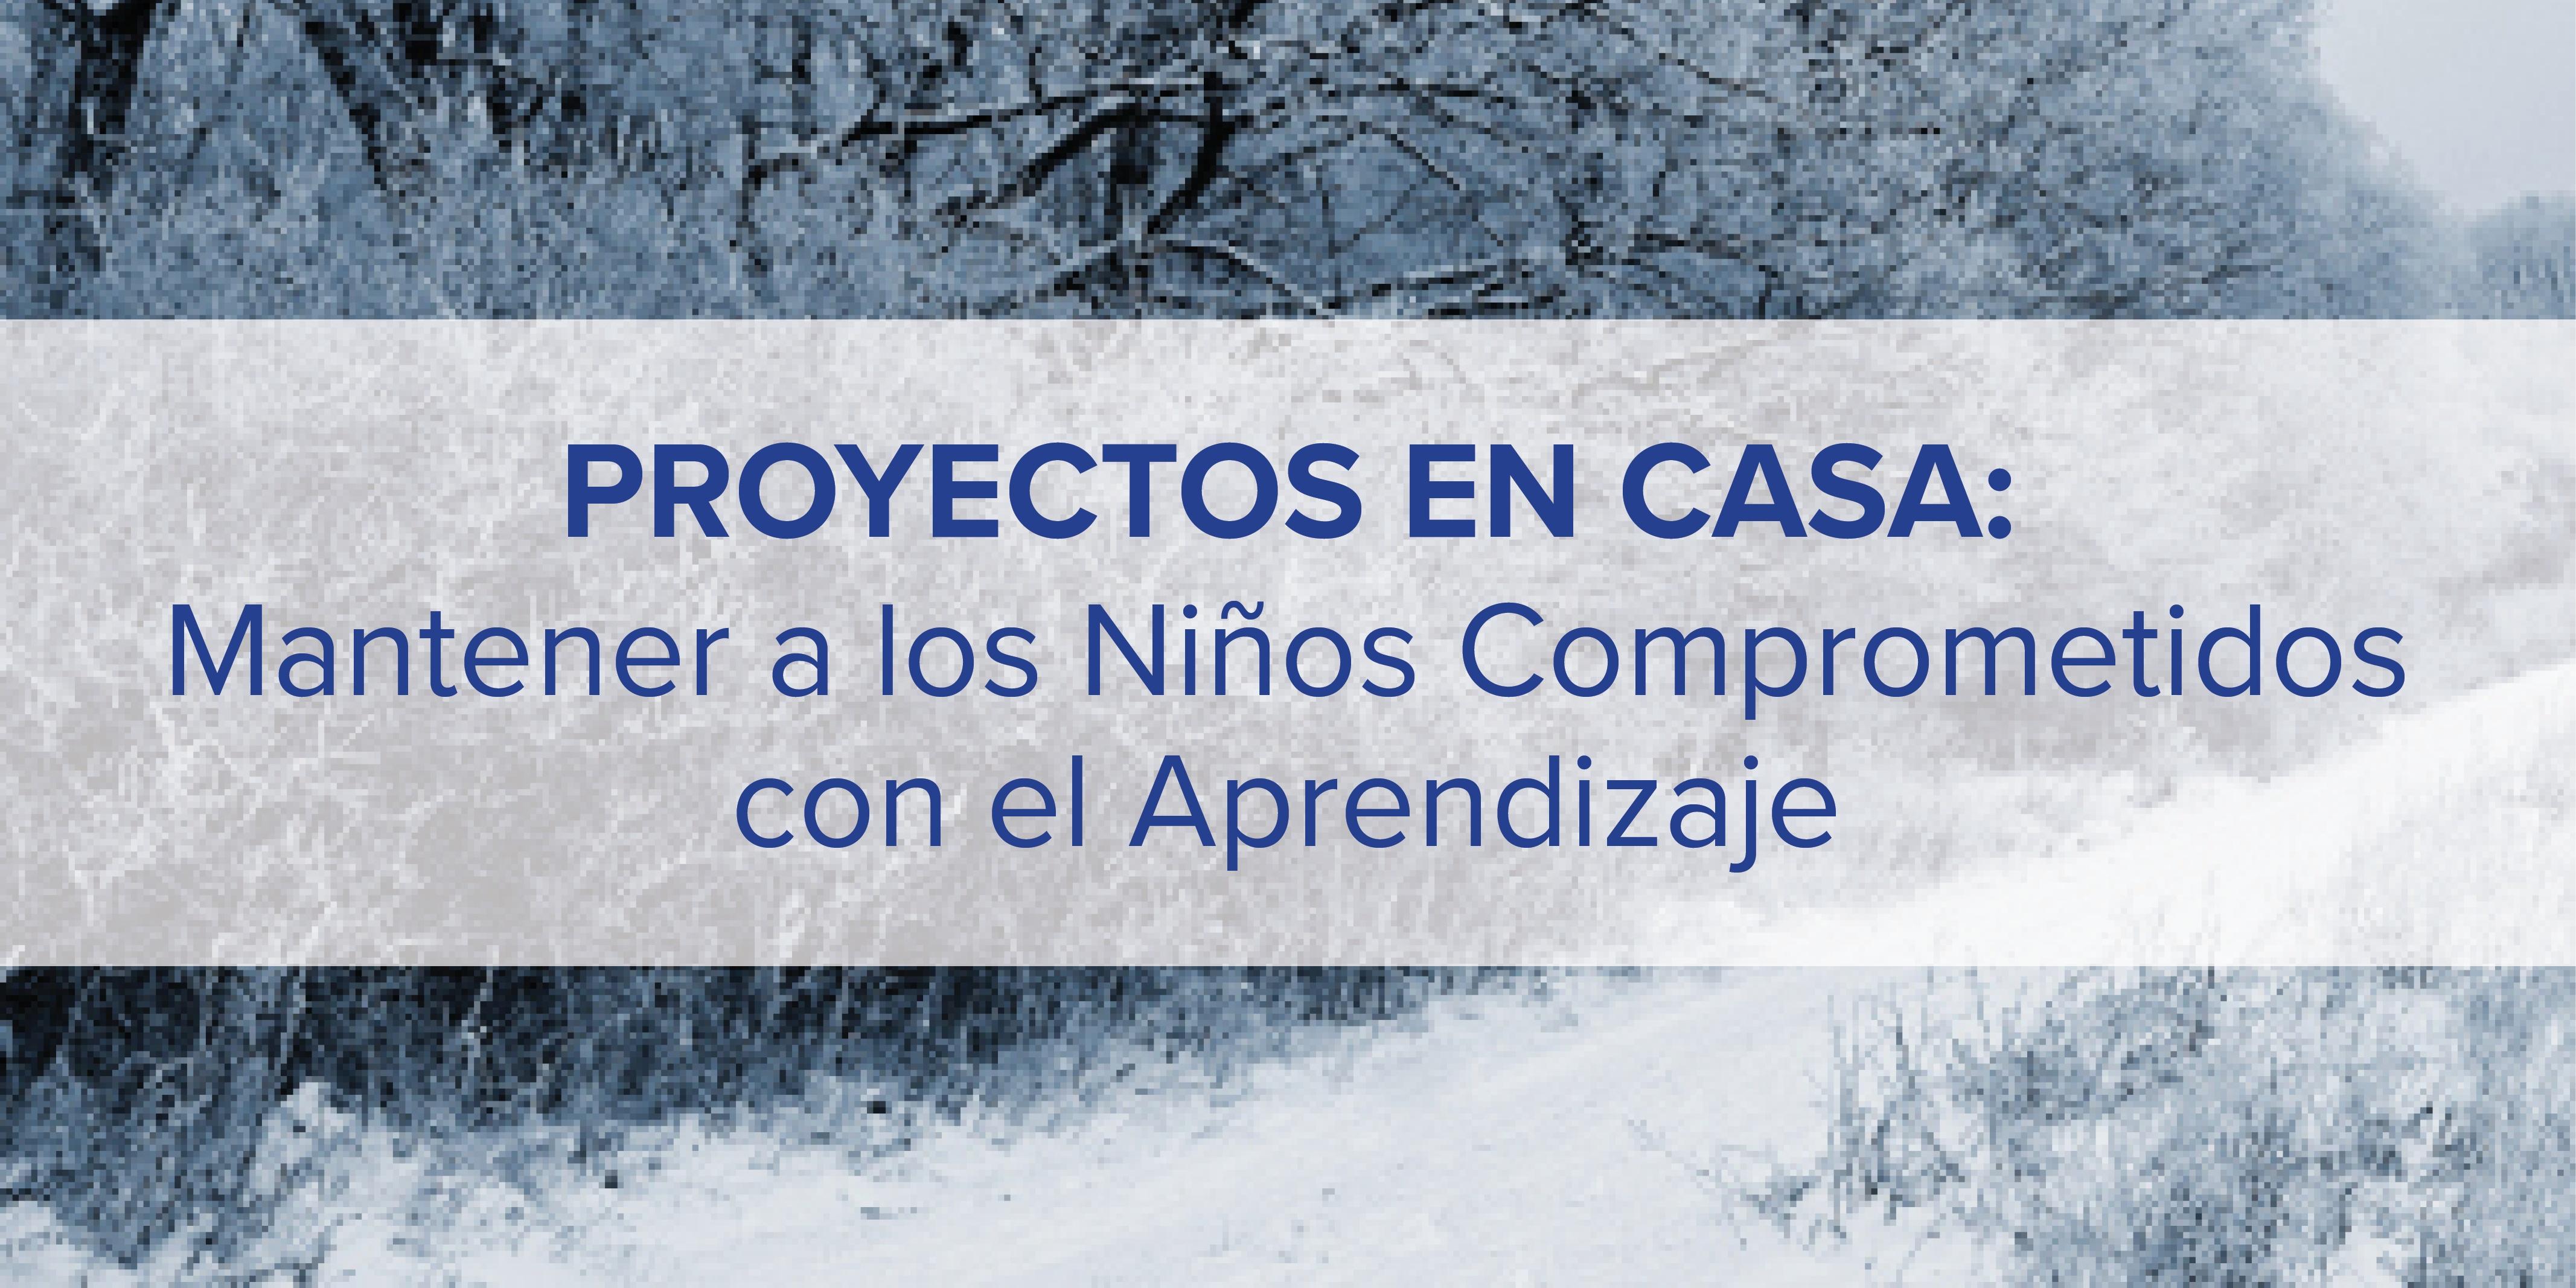 ProyectosEnCasa